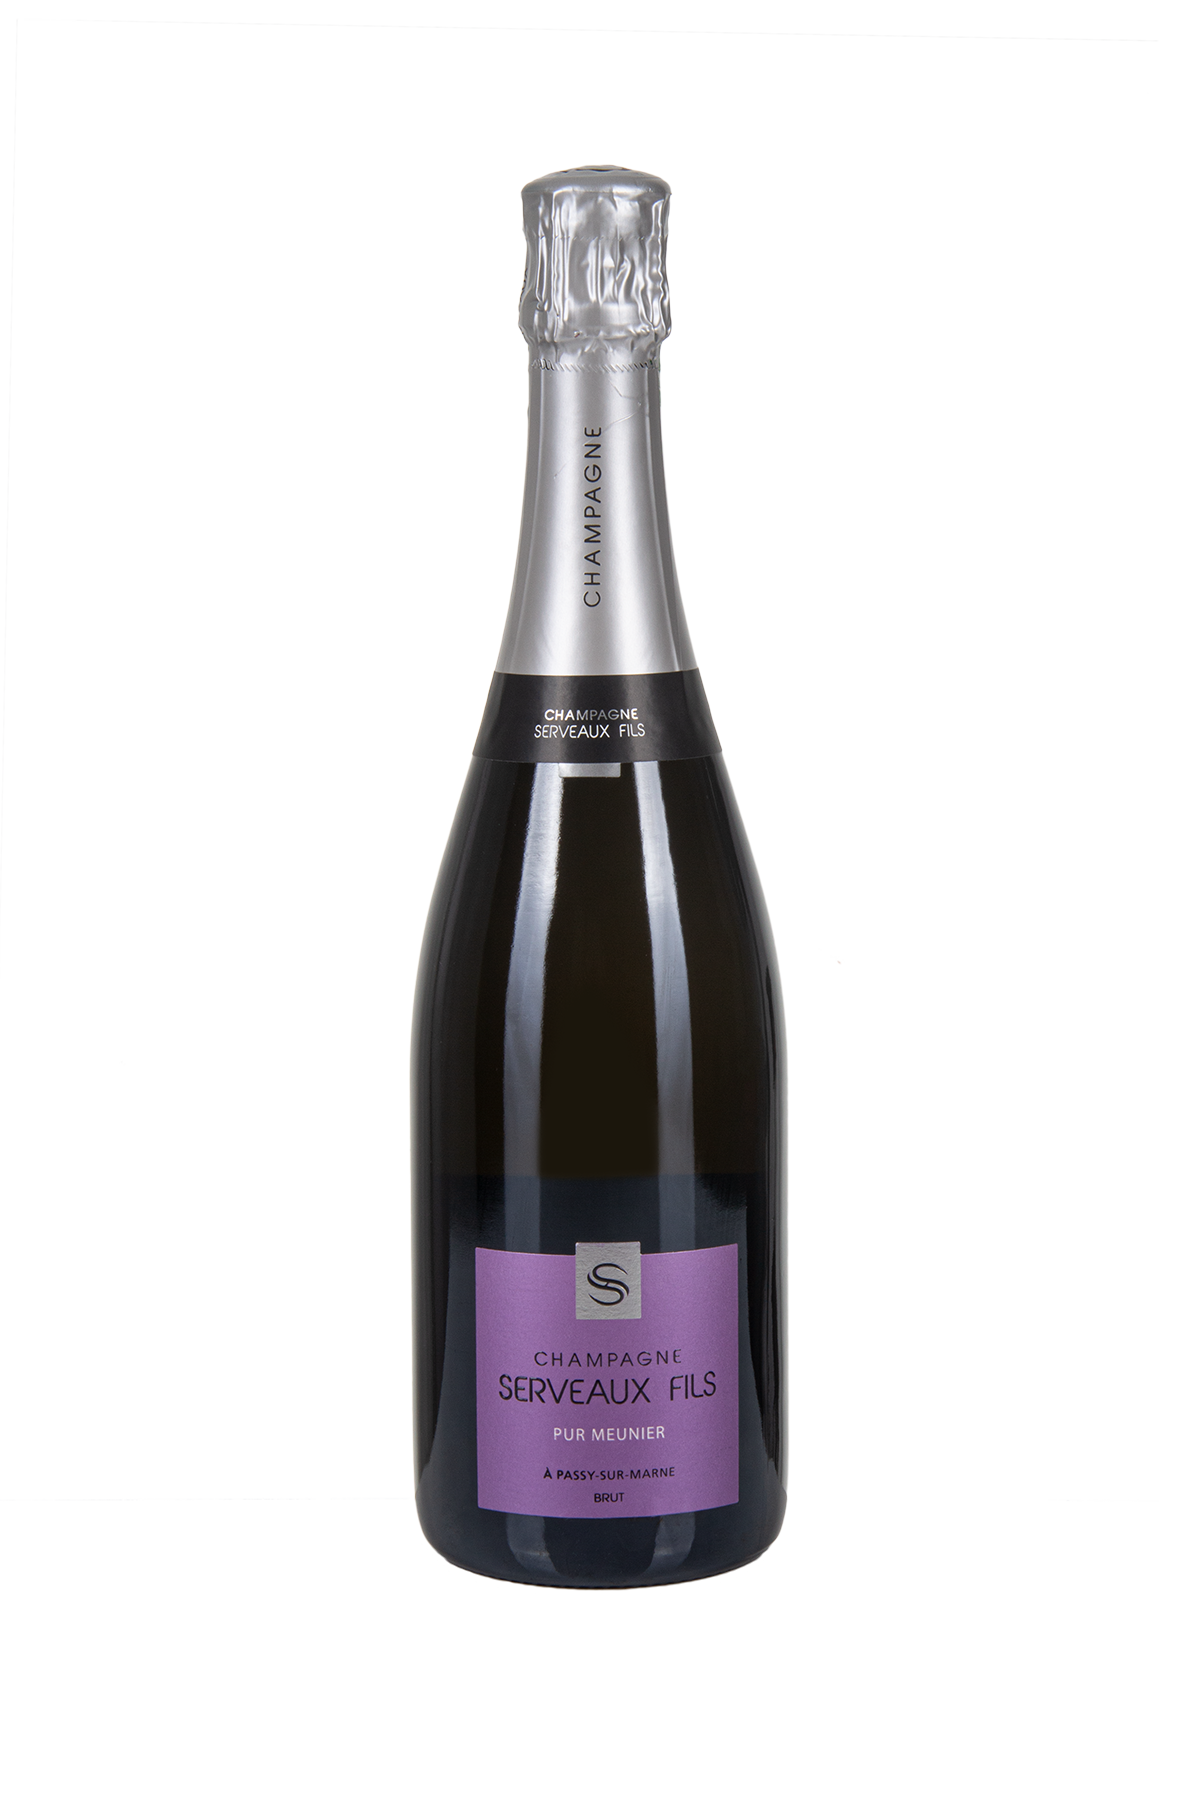 Das Bild zeigt die Flasche Champagne AOC Brut Serveaux Fils- Cuvée Pur Meunier